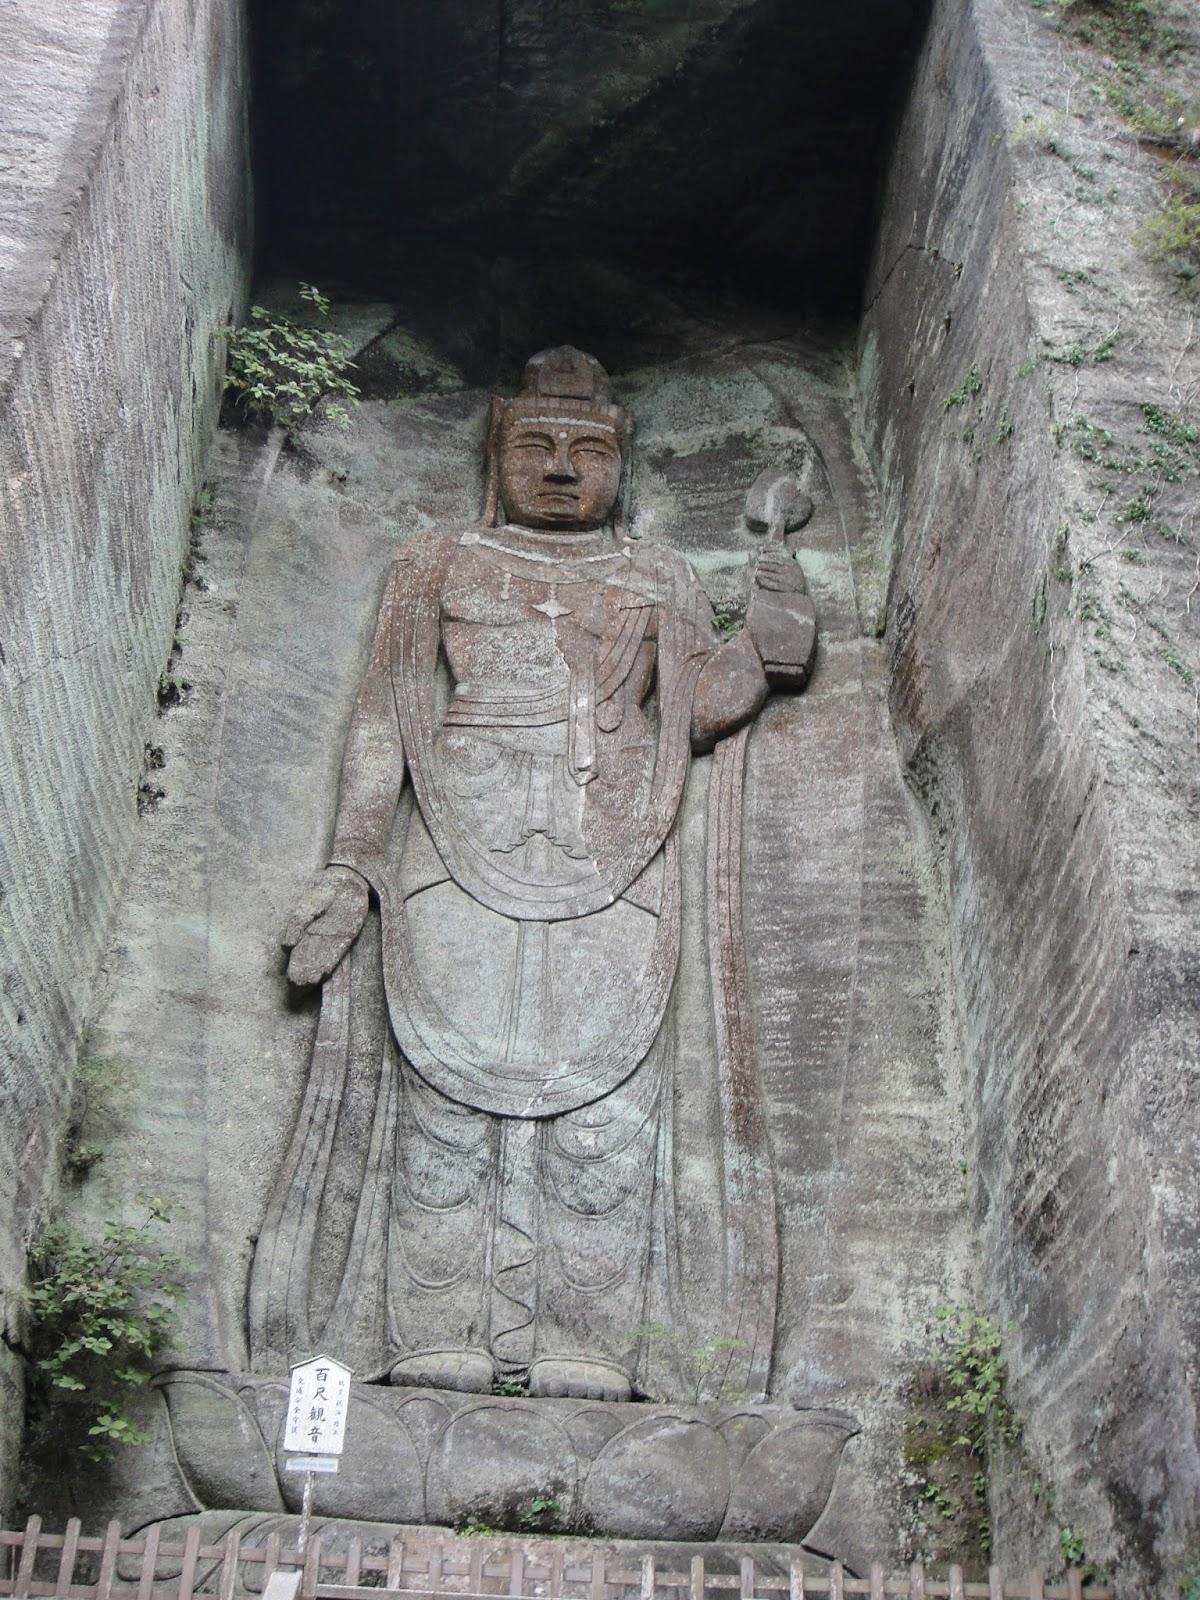 A huge Buddha statue